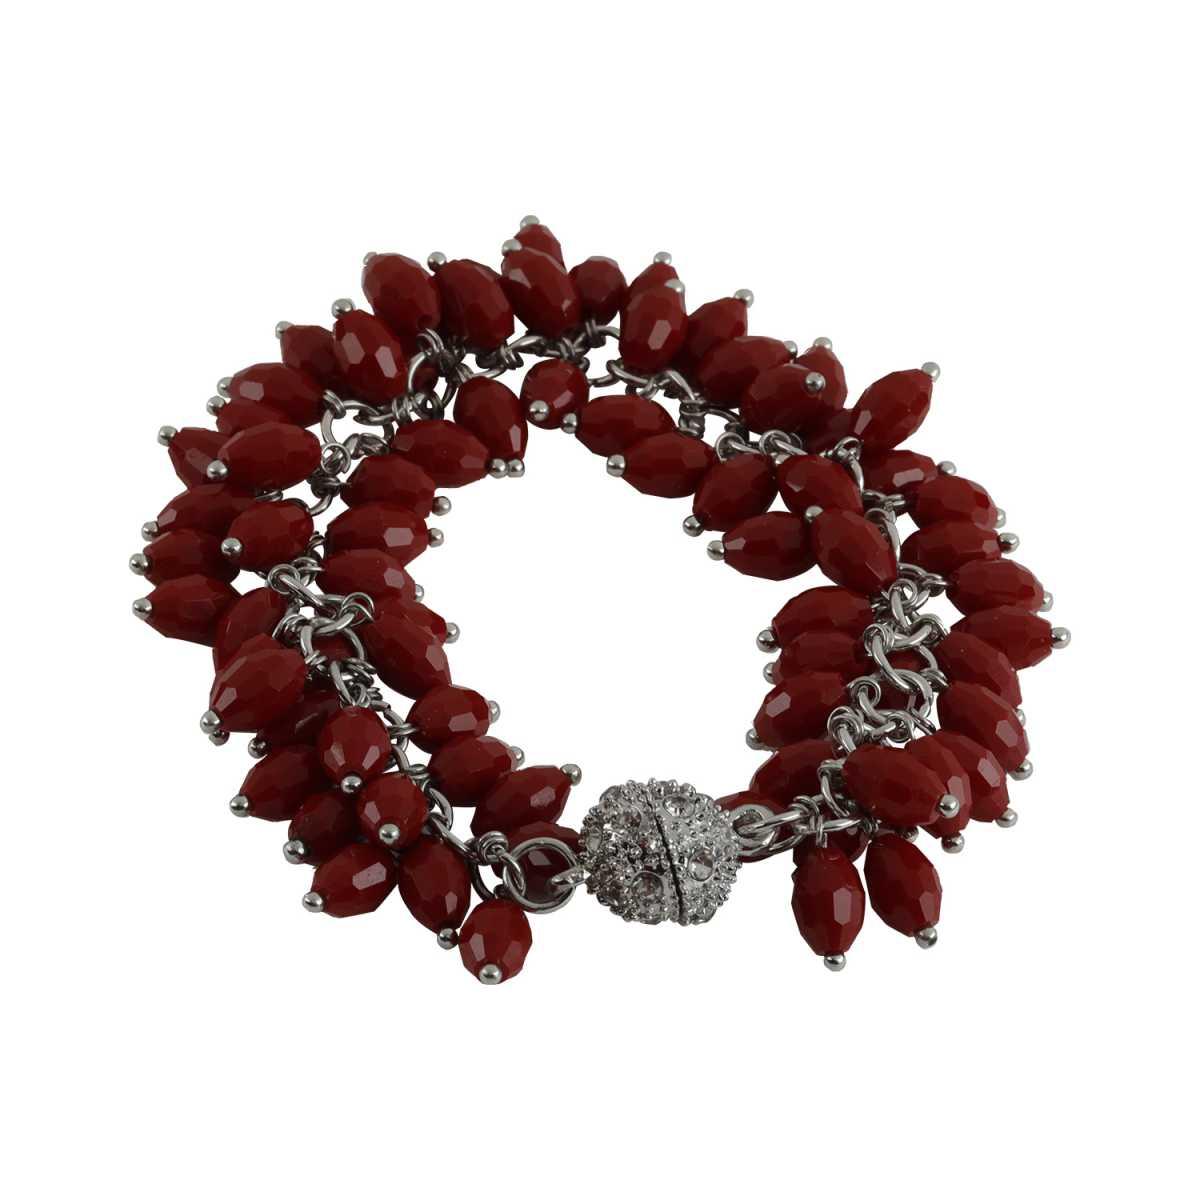 Hot Red Pearl Diamond Bracelet For Girls And Women